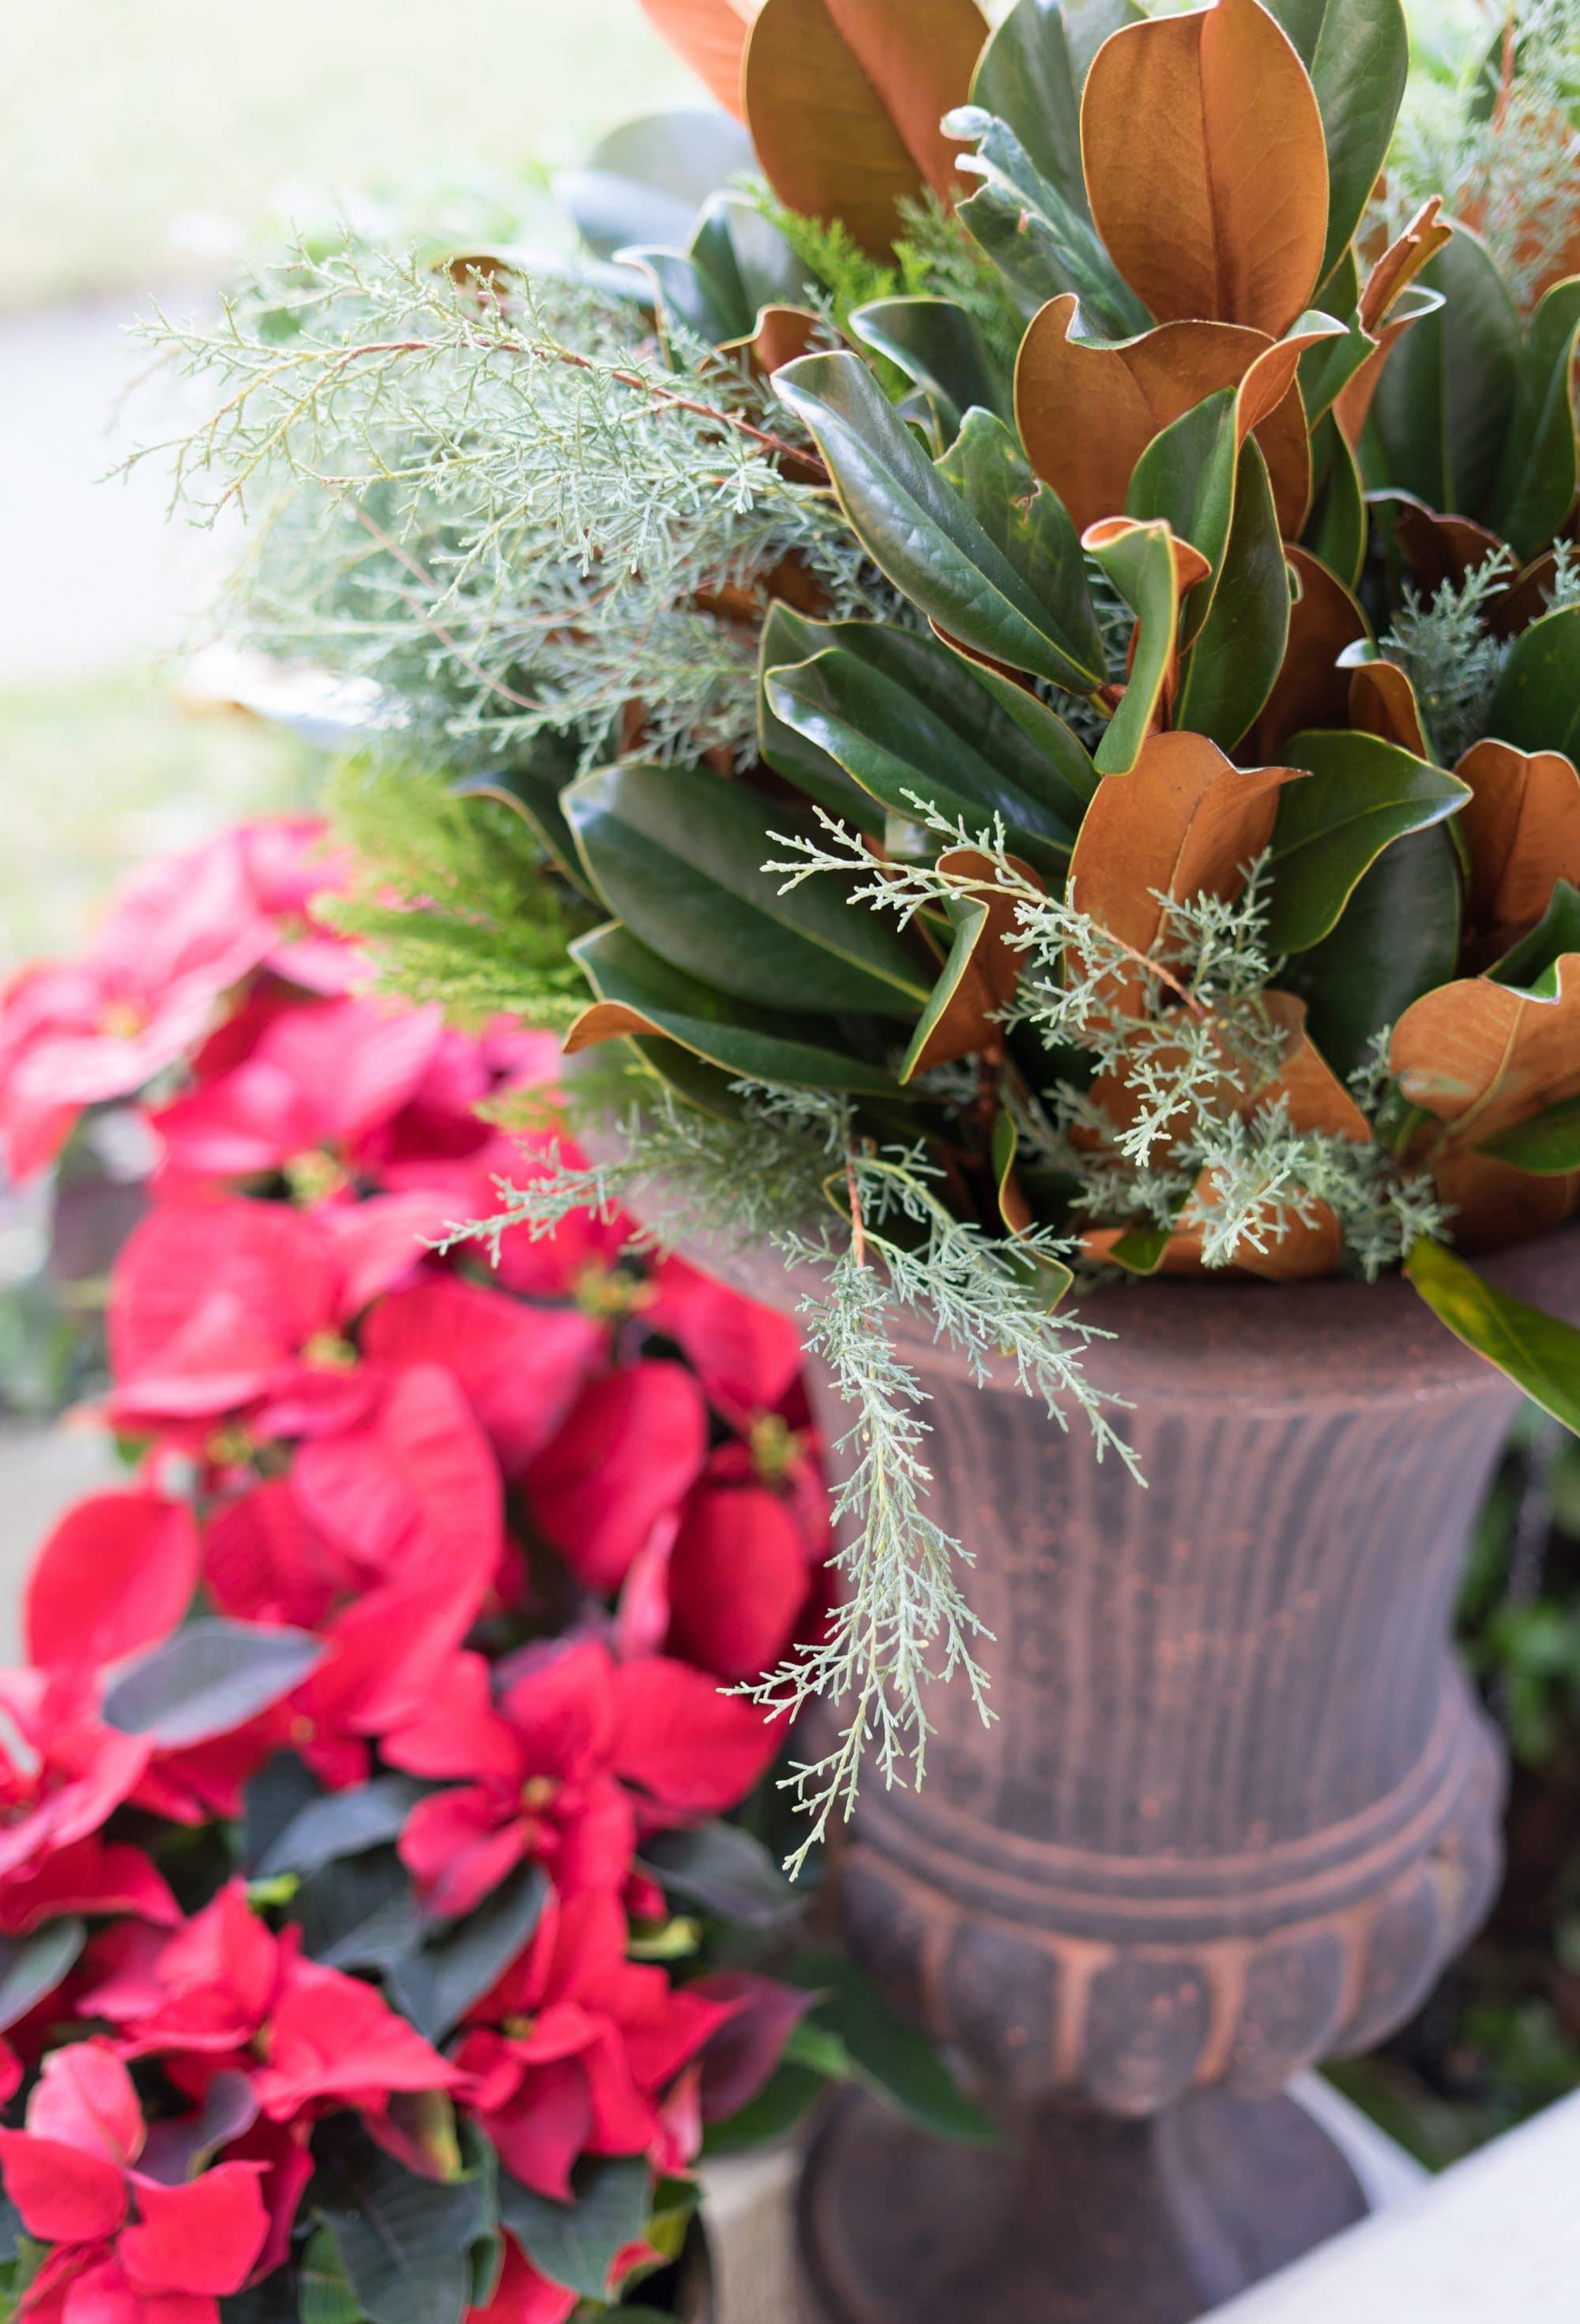 Blogger Ashley Brooke's 4 Steps to Fresh Front Door Holiday Decor   www.ashleybrookedesigns.com   Featuring: The Magnolia Company Holiday Decor